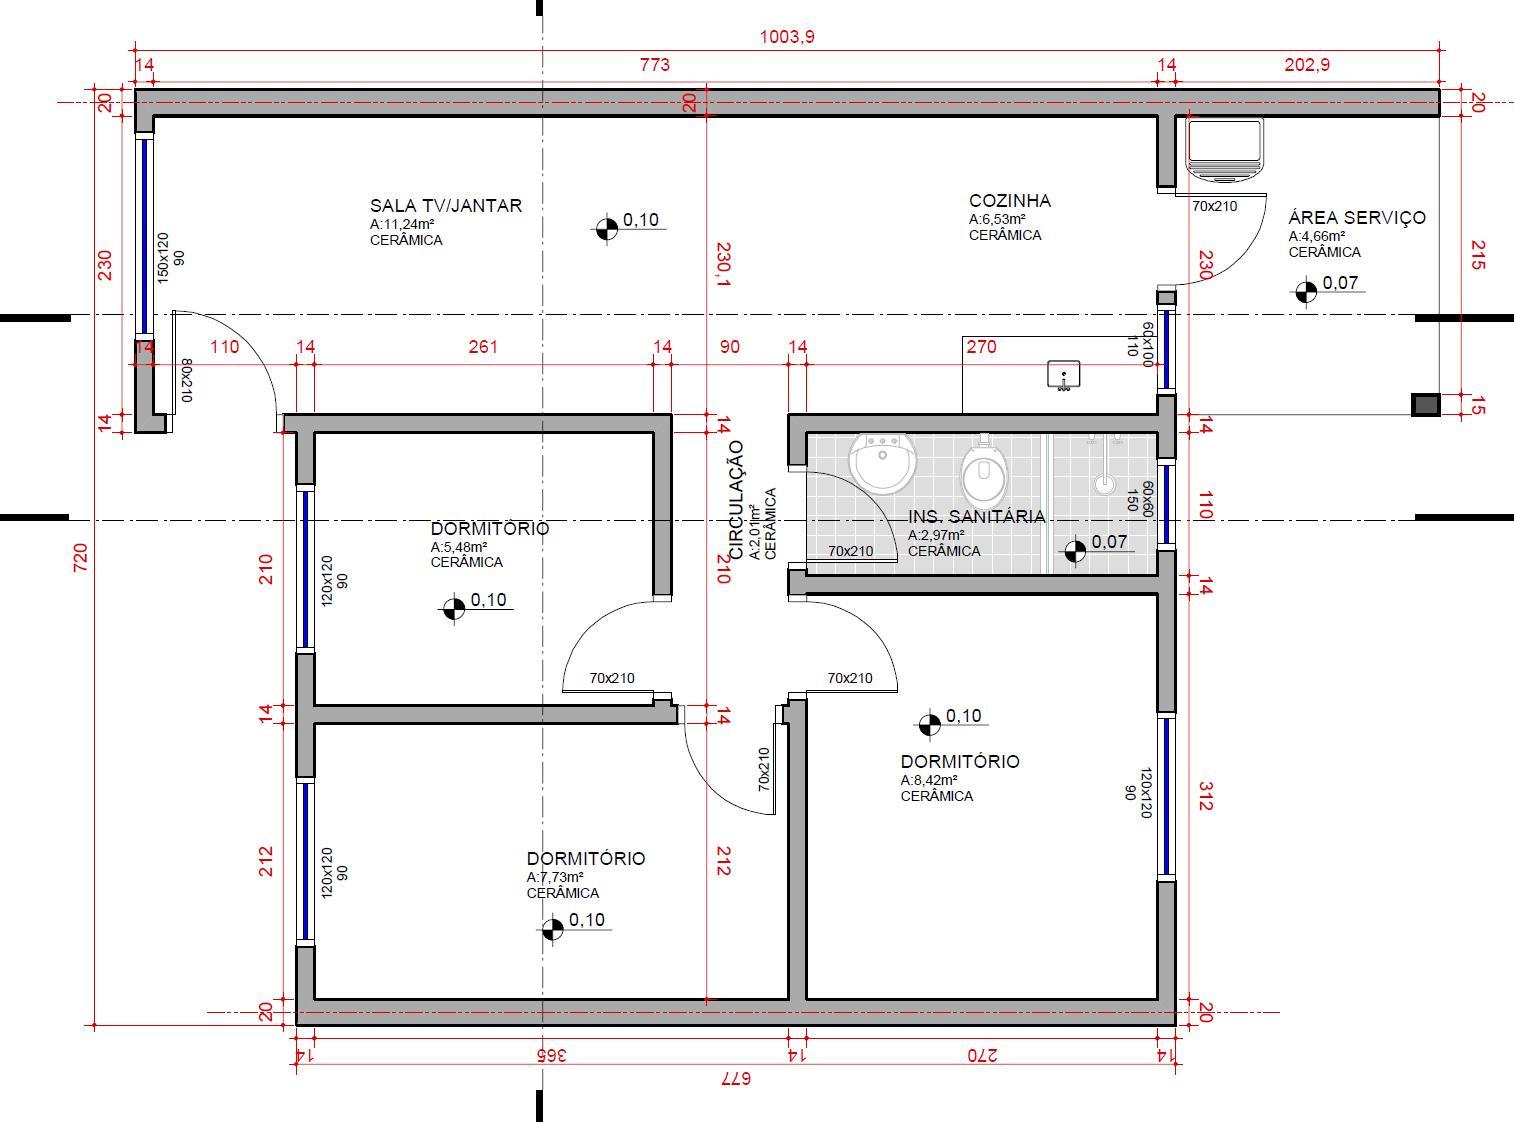 18° Denominar o tipo de desenho (planta baixa planta de cobertura  #323299 1514 1122